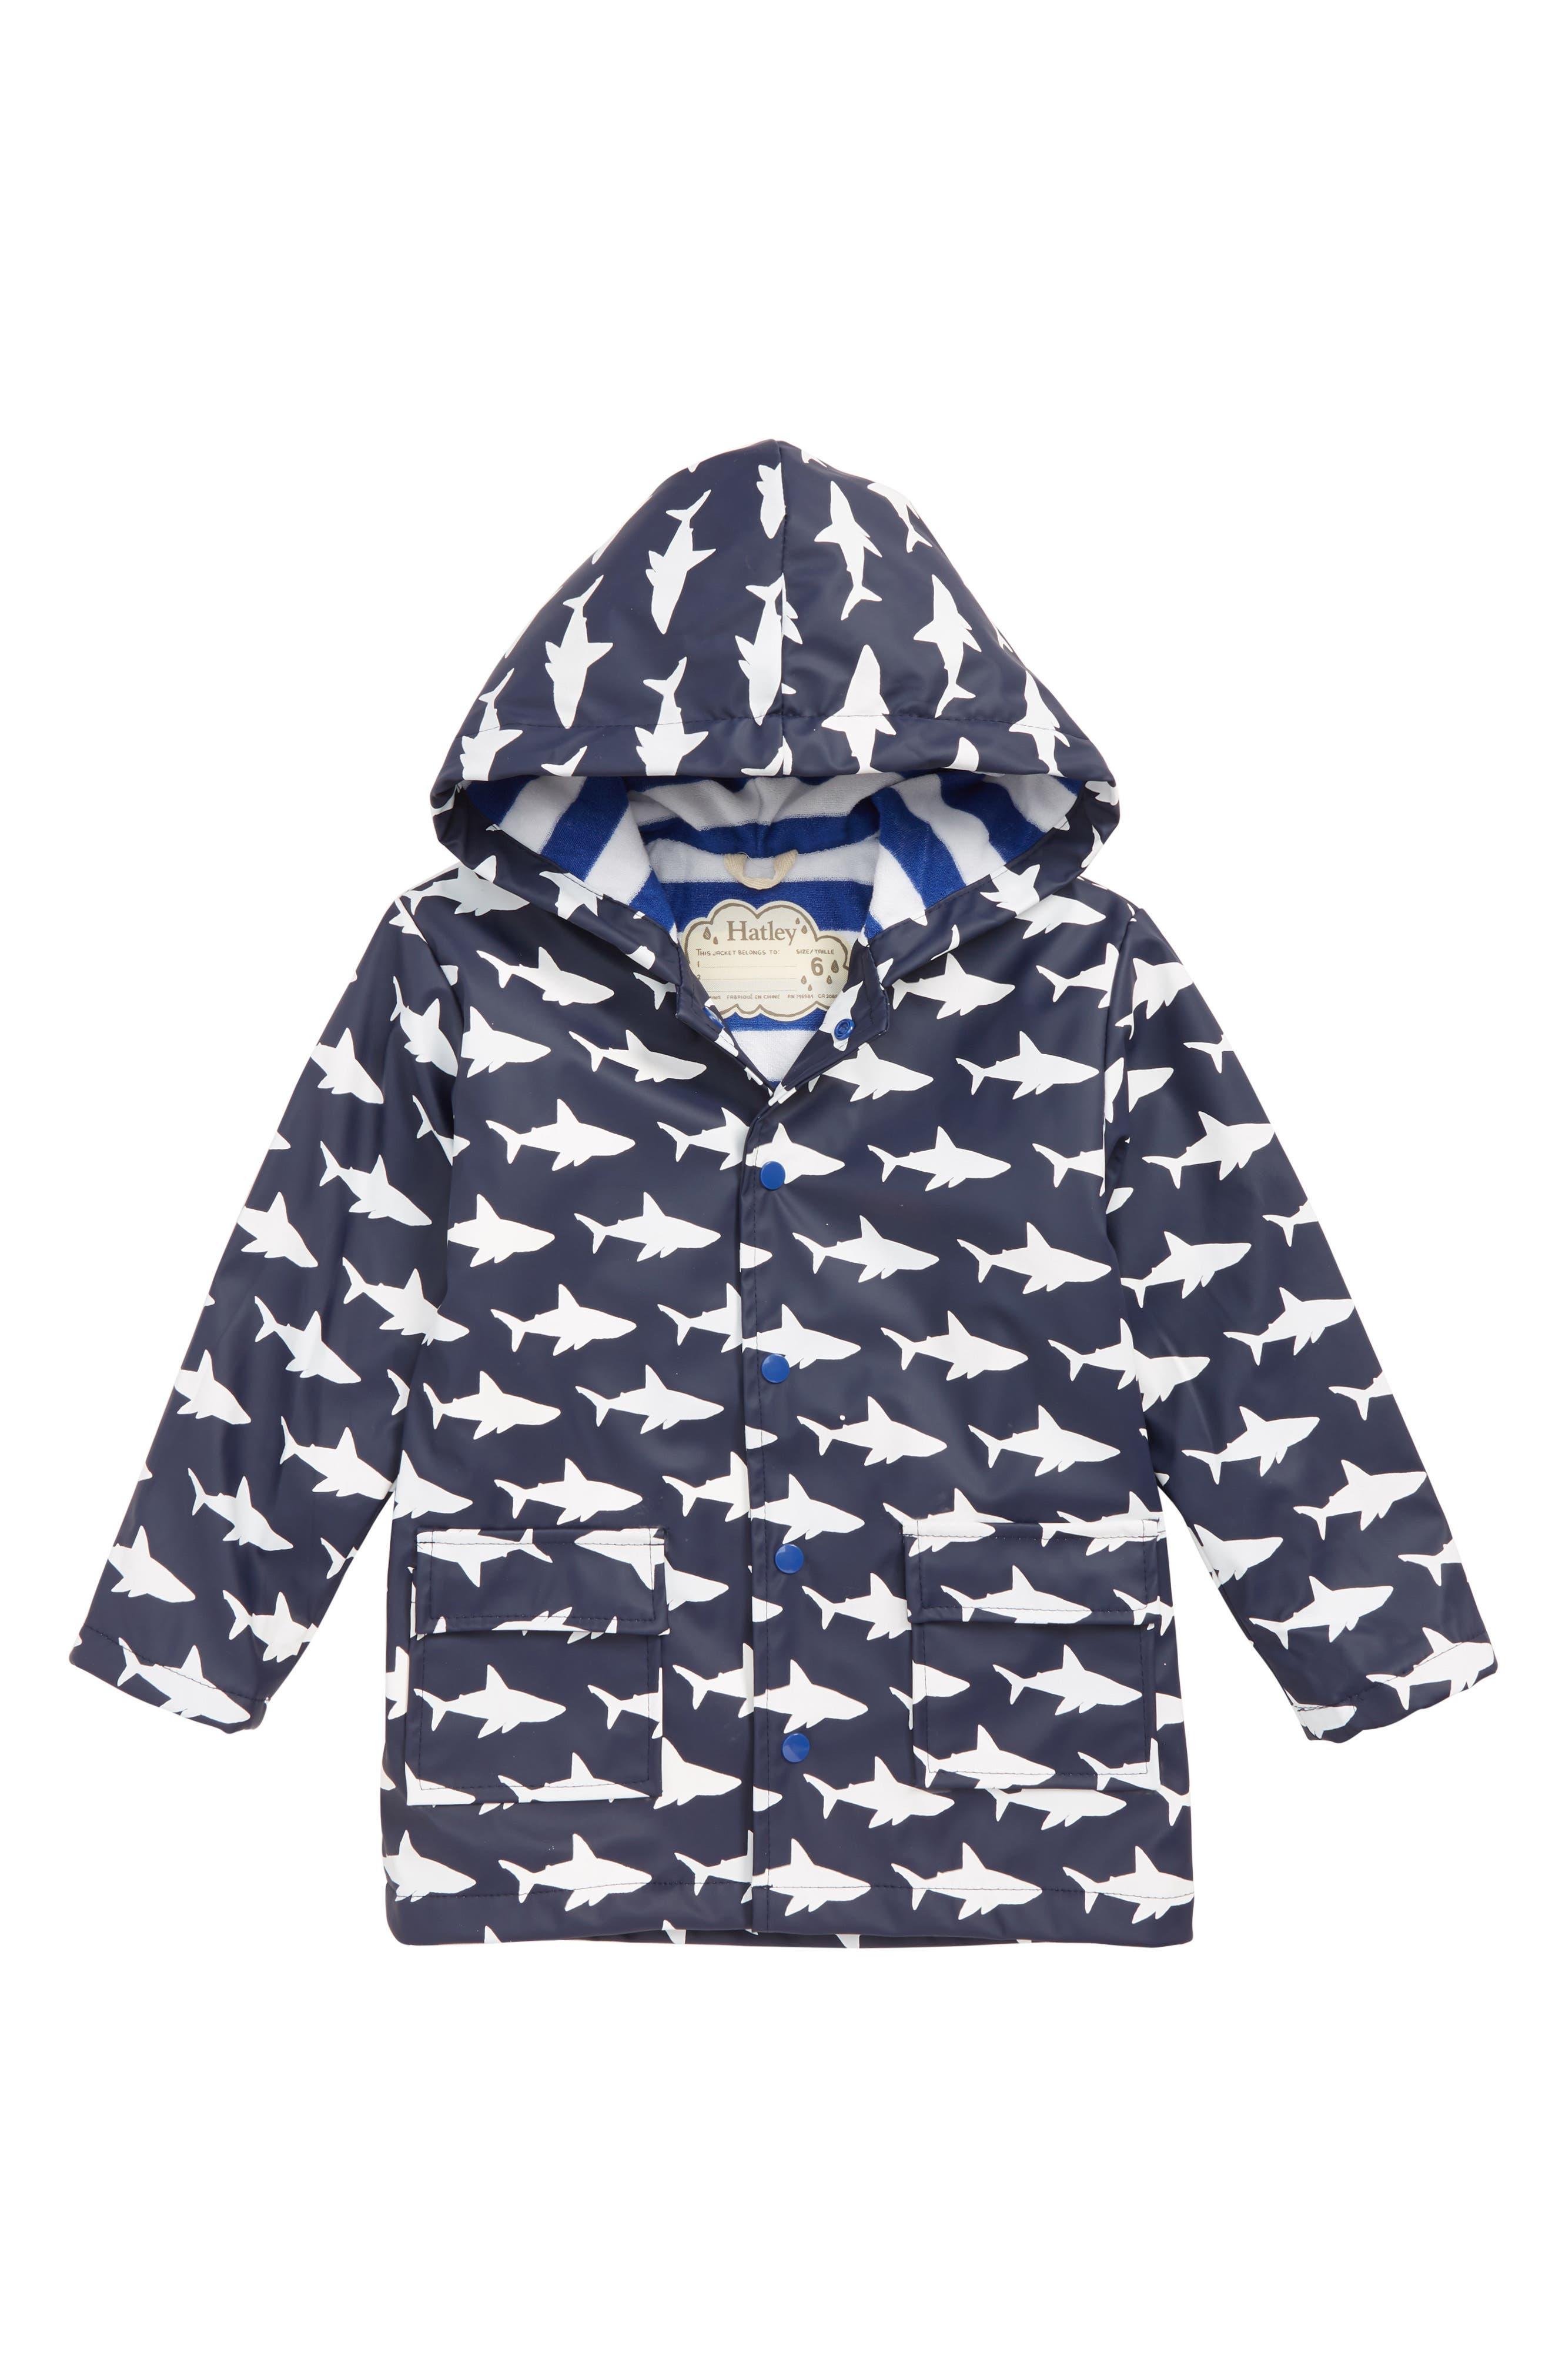 HATLEY, Color Changing Sharks Water Resistant Raincoat, Main thumbnail 1, color, BLUE